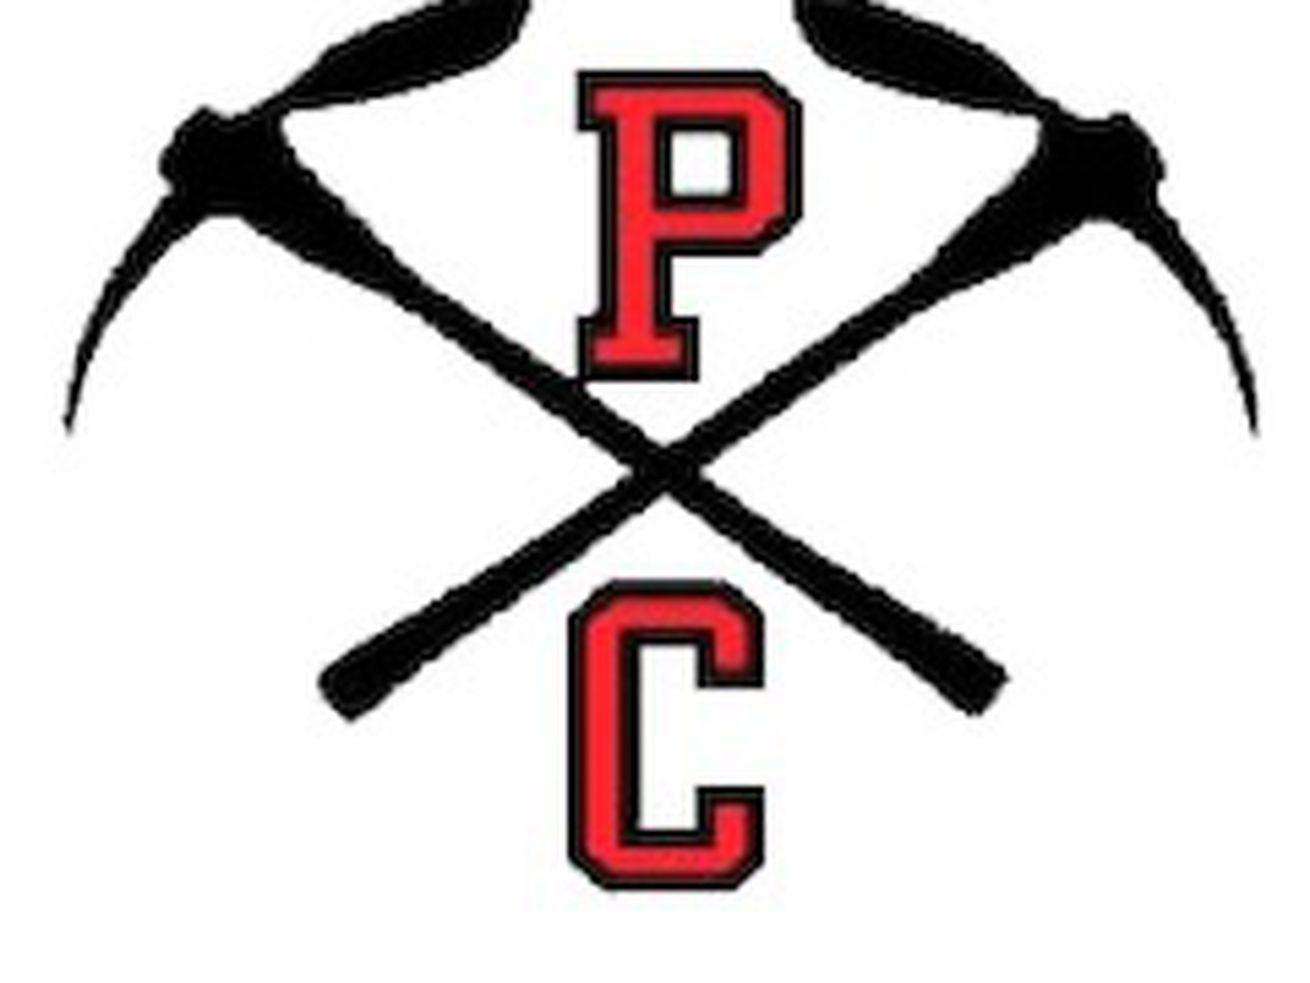 High school football: Carson Tabaraccikeys explosive Park City offense in dominant Region 10 win over Mountain View